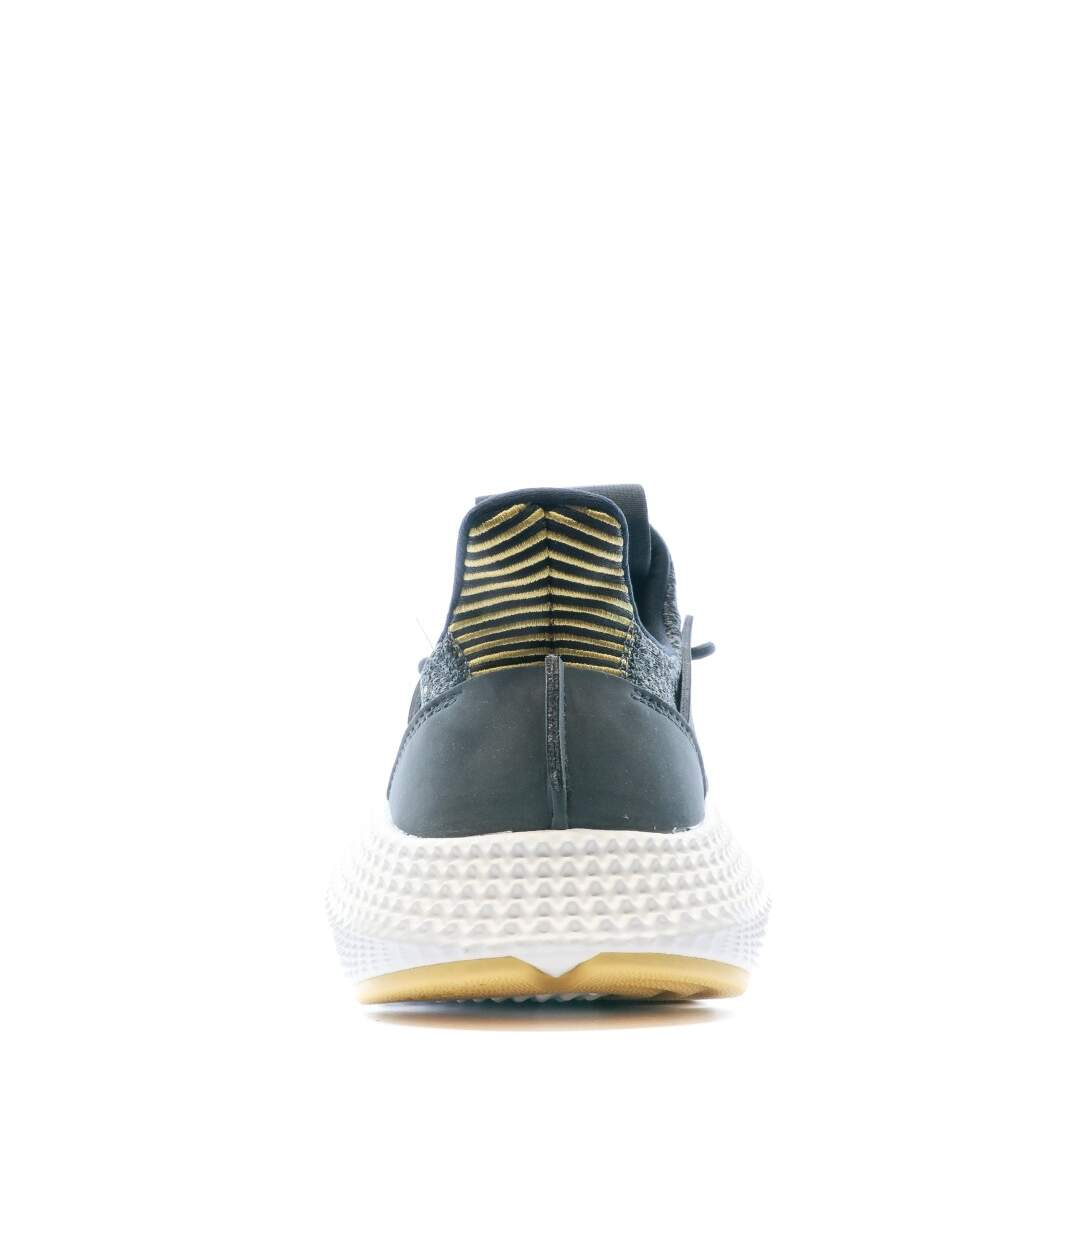 Grande Vente Prophere Baskets Gris Homme Adidas Originals dsf.d455nksdKLFHG